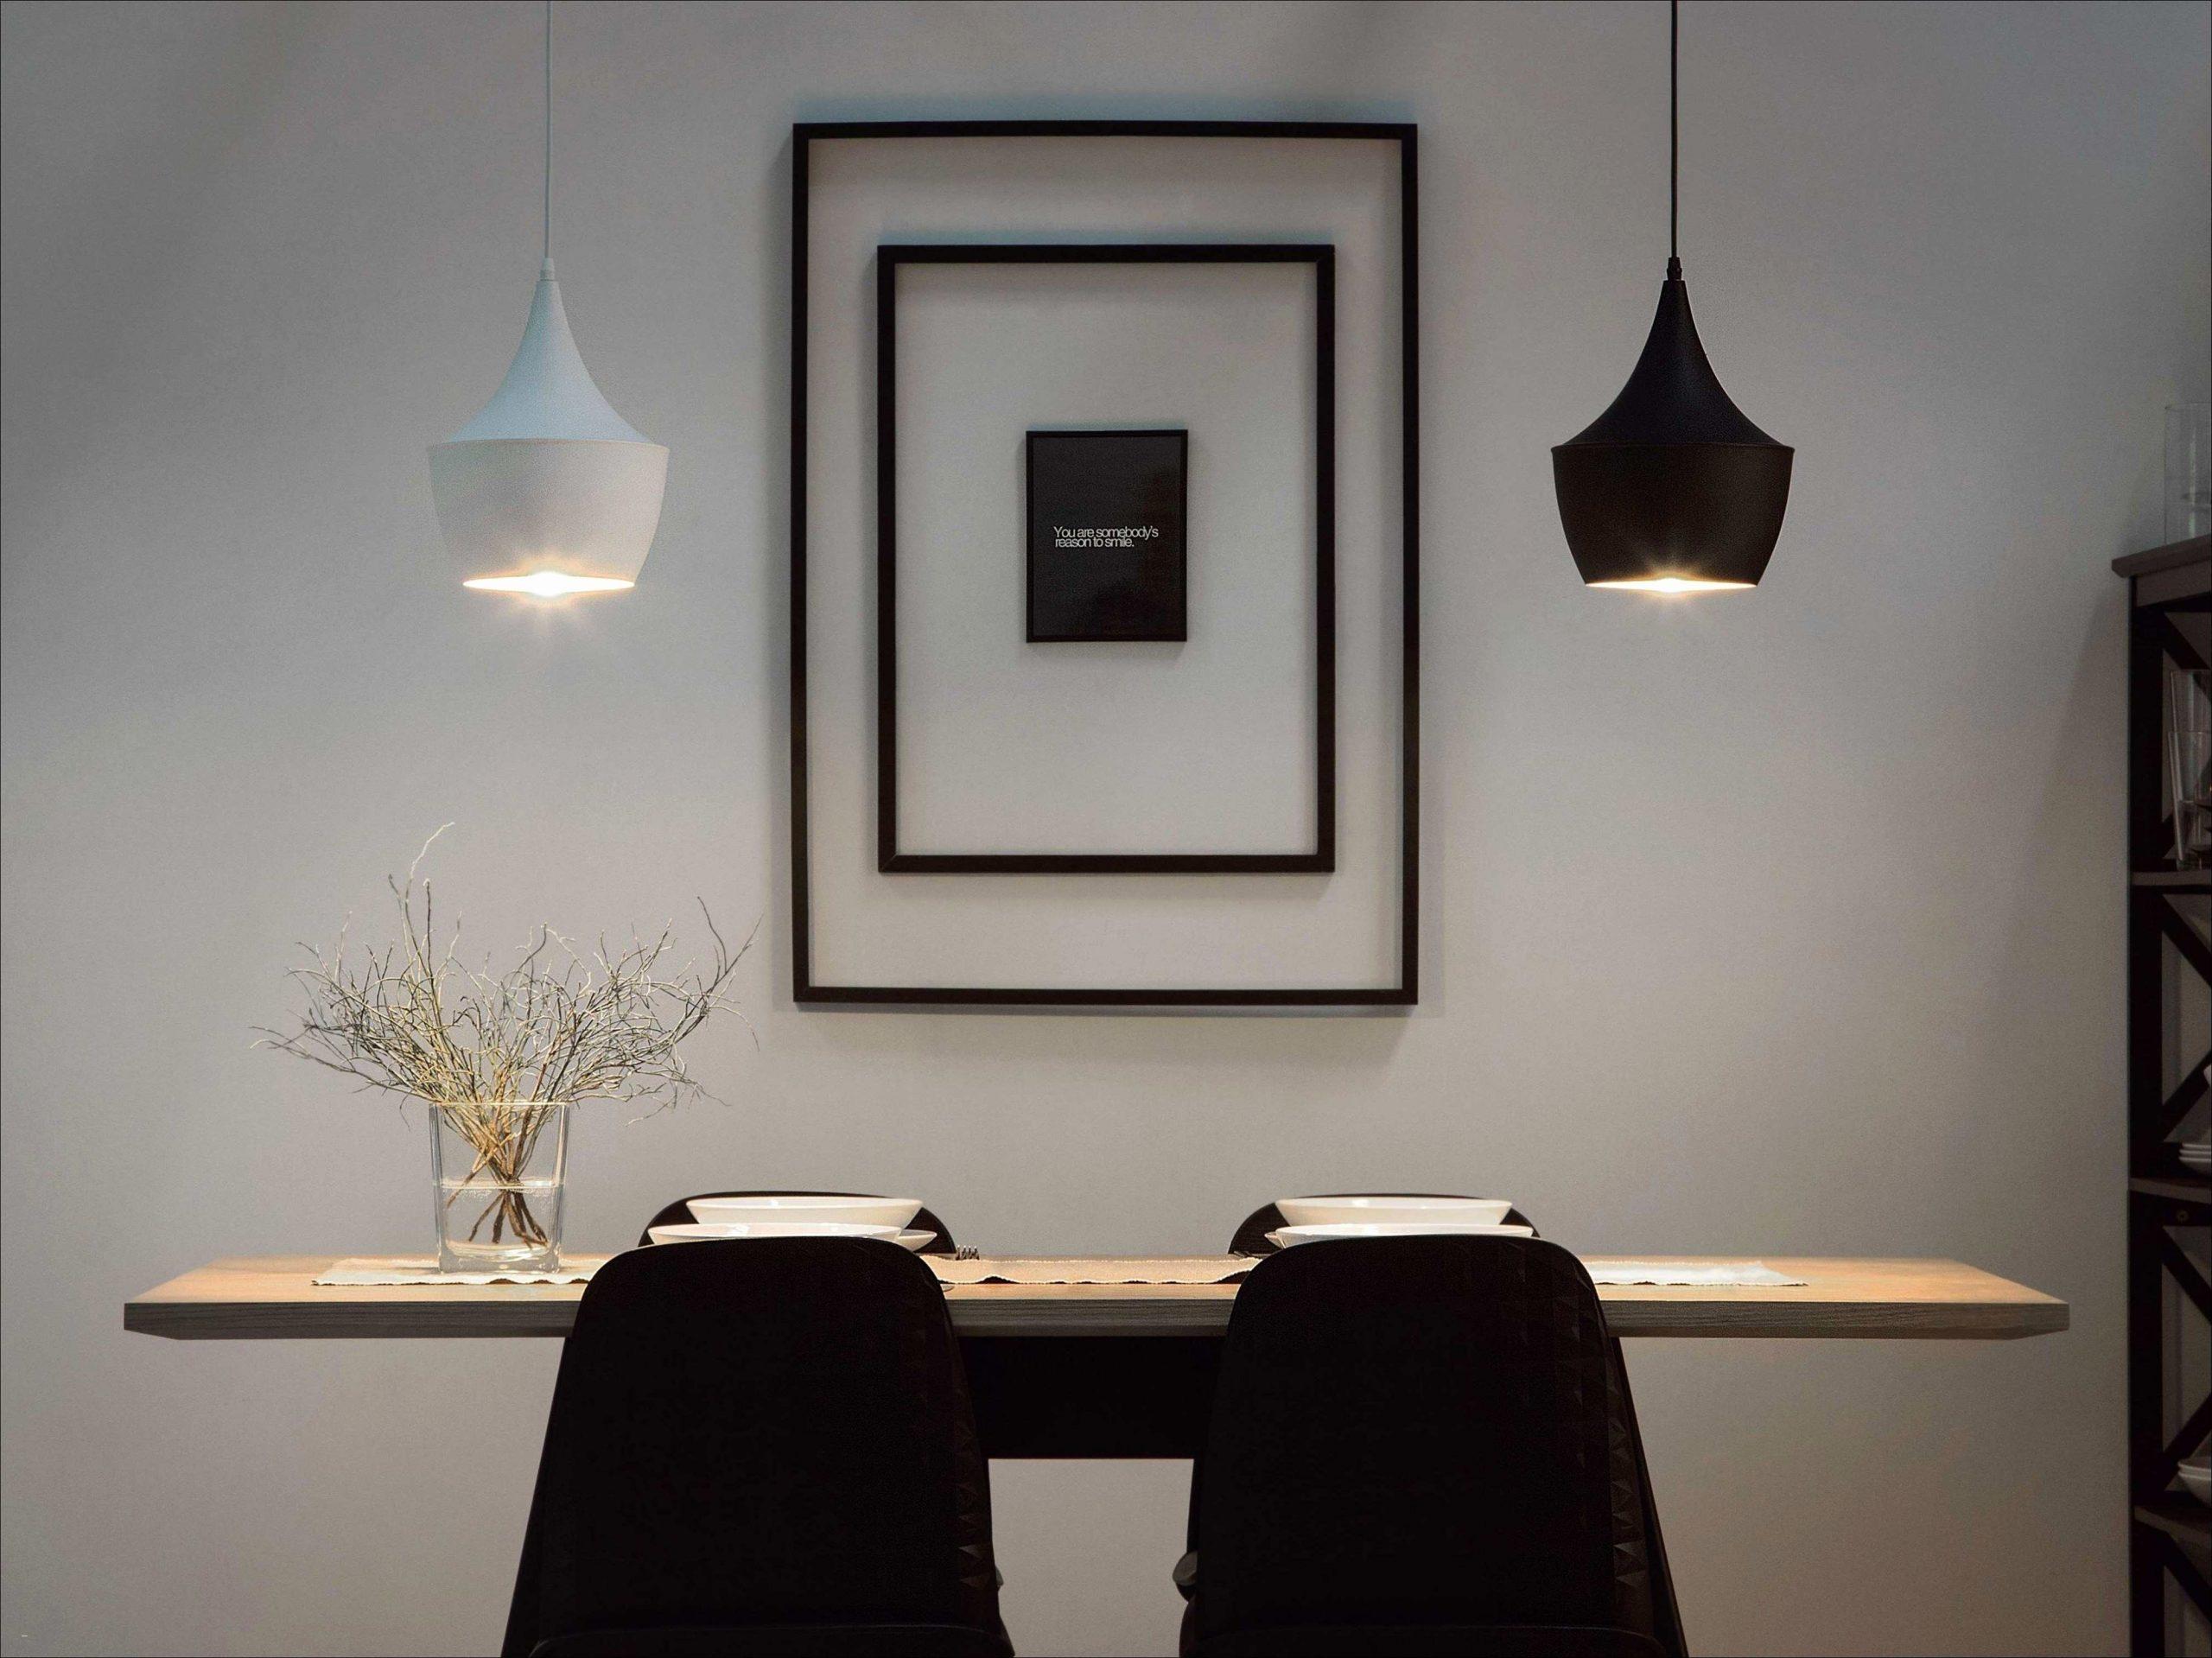 Full Size of Indirekte Beleuchtung Wand Ideen Frisch Indirekte Beleuchtung Bad Selber Bauen Aufnahme Küchenbeleuchtung Wohnzimmer Indirekte Beleuchtung Wohnzimmer